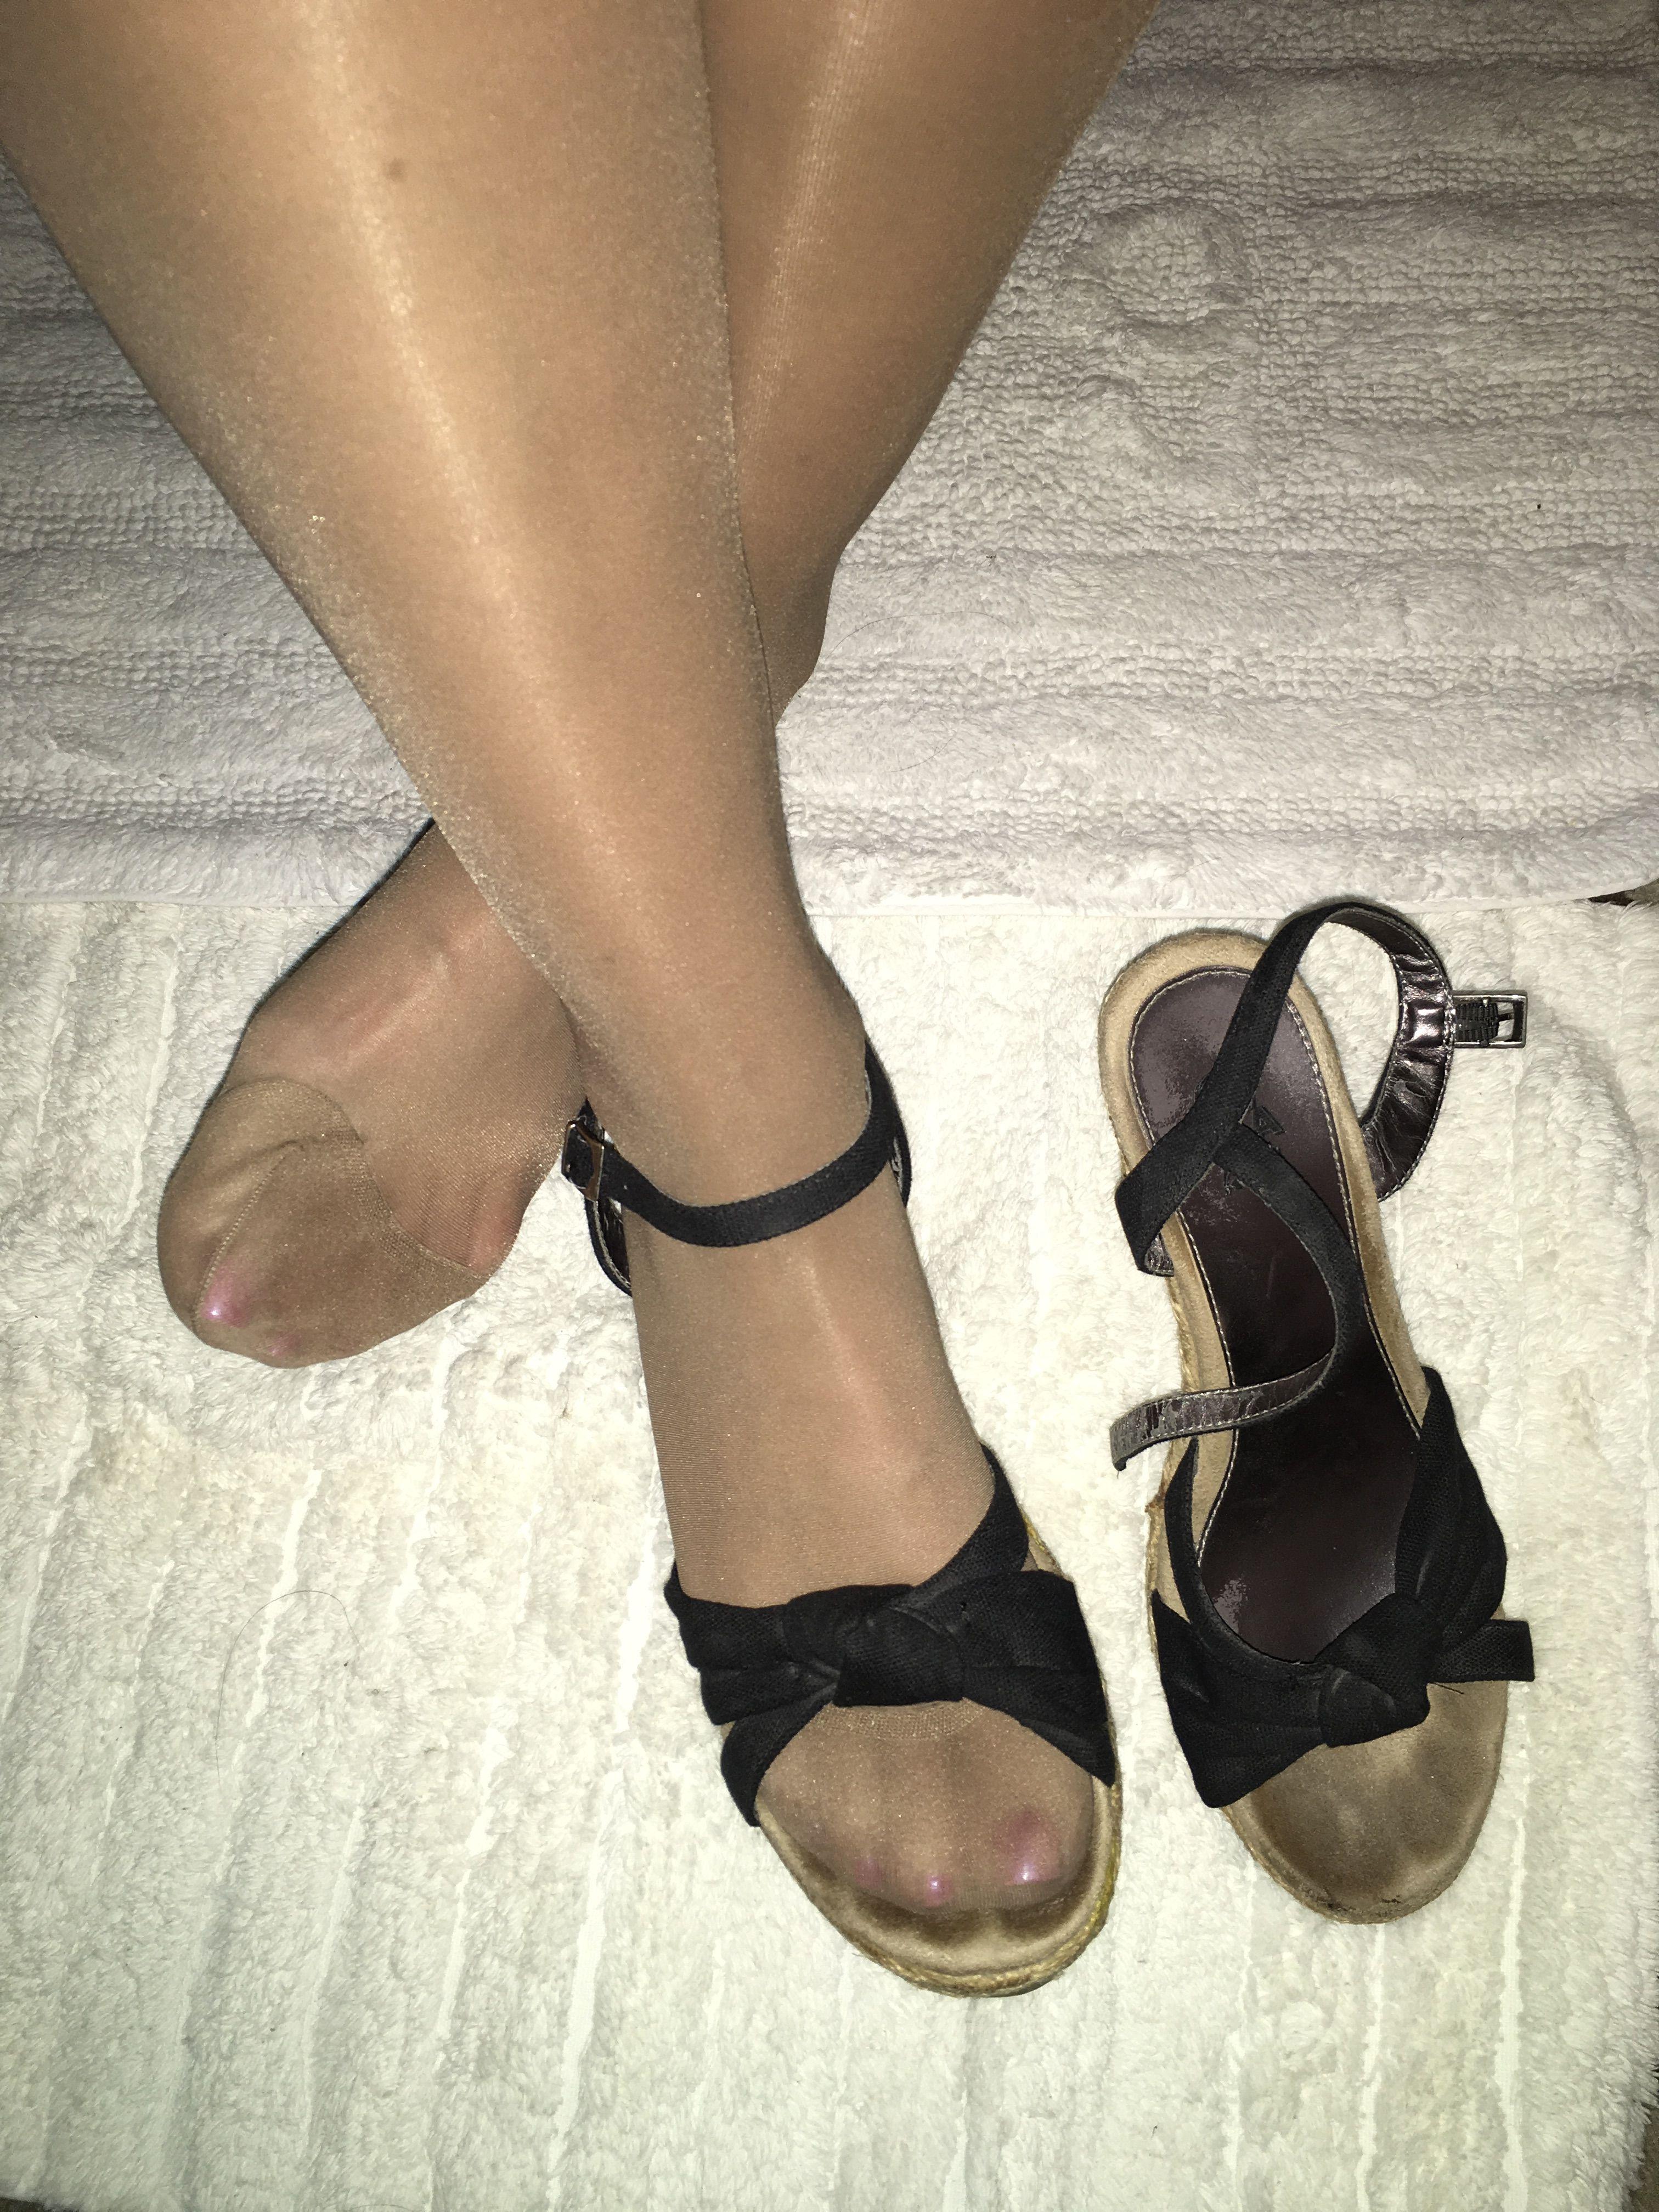 pantyhose-reinforce-toe